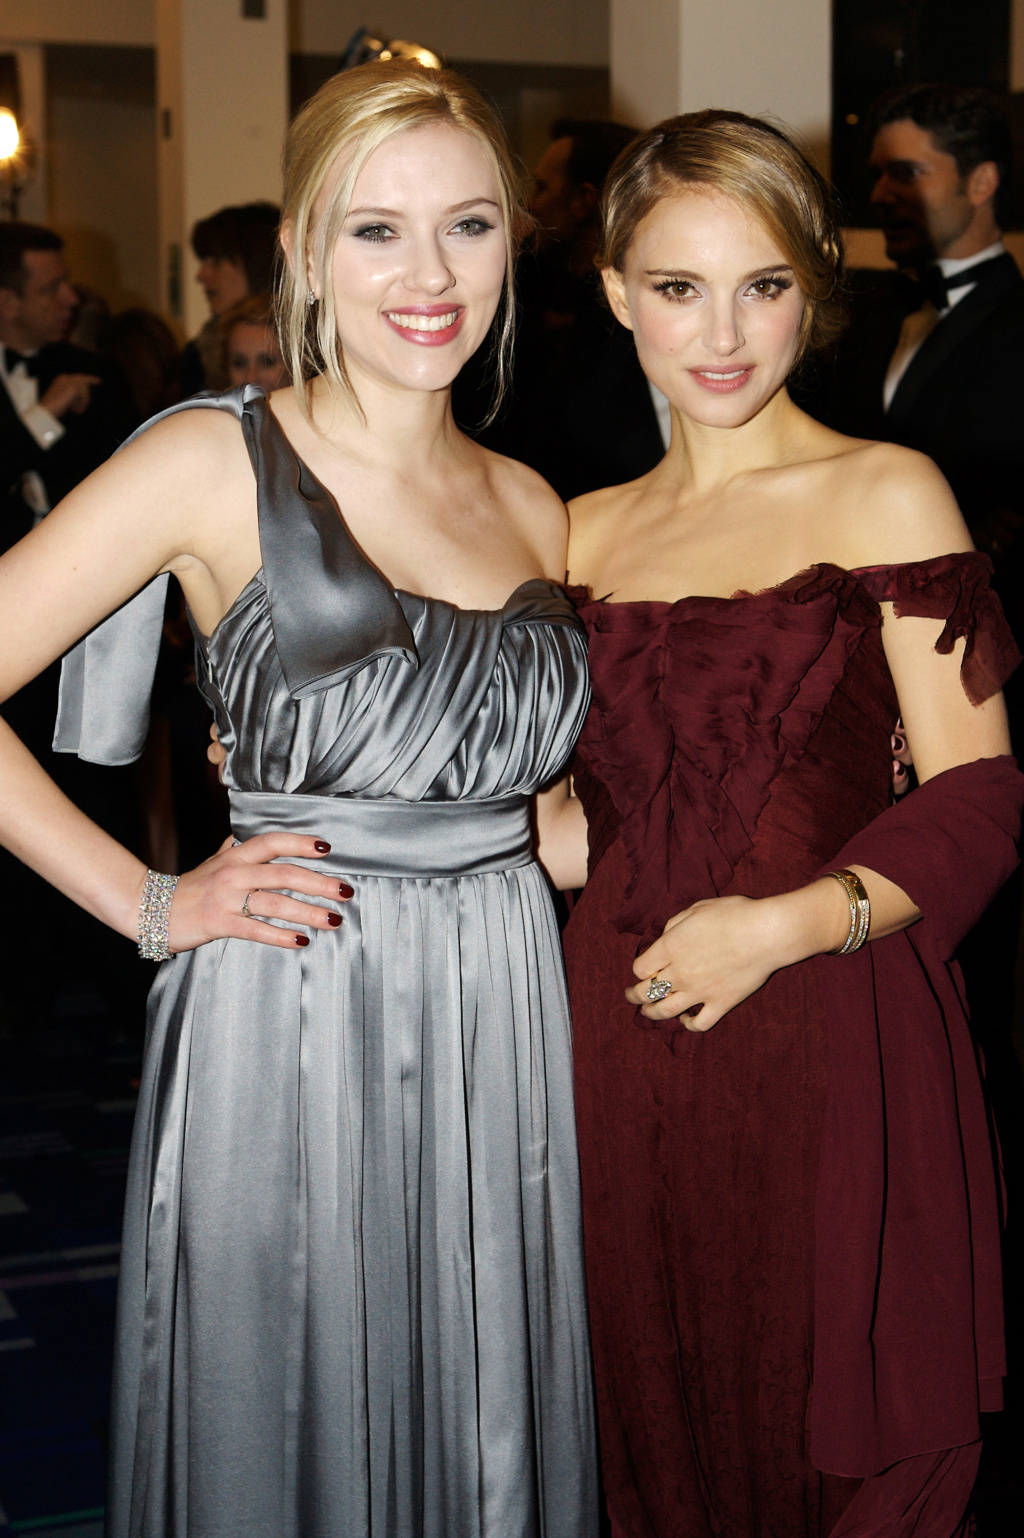 ¿Cuánto mide Scarlett Johansson? - Altura - Real height 79842210